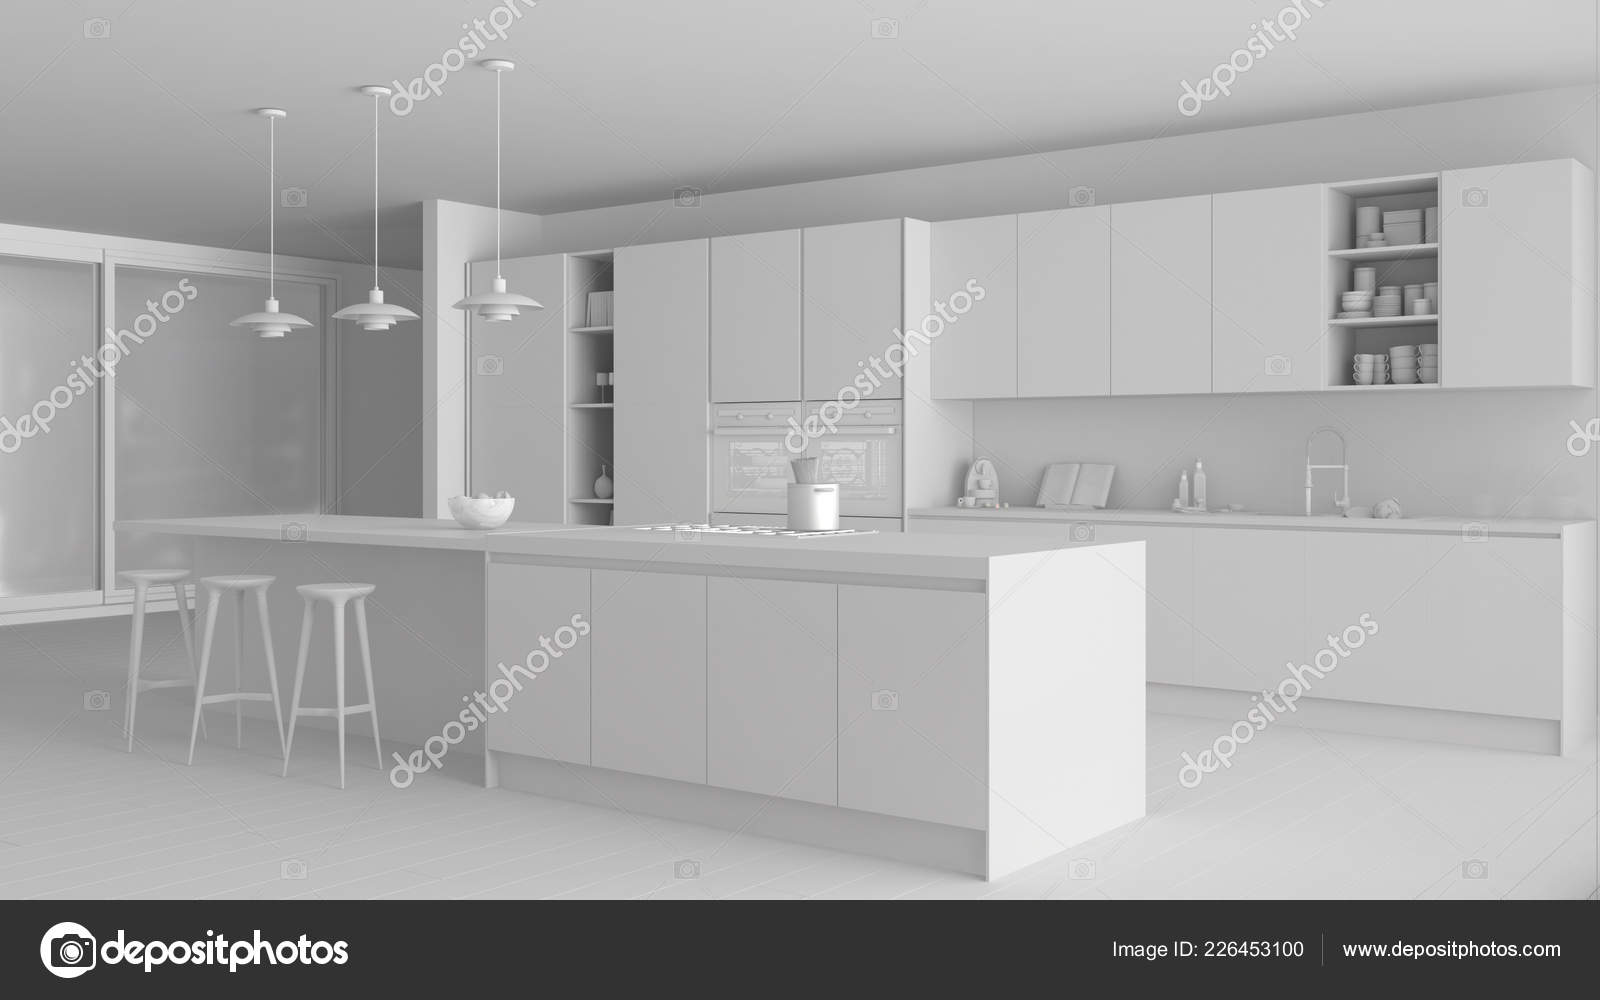 islands for the kitchen stone sink 全白工程的现代简约厨房与岛屿和大全景窗口 镶木地板 吊灯 当代建筑 镶木